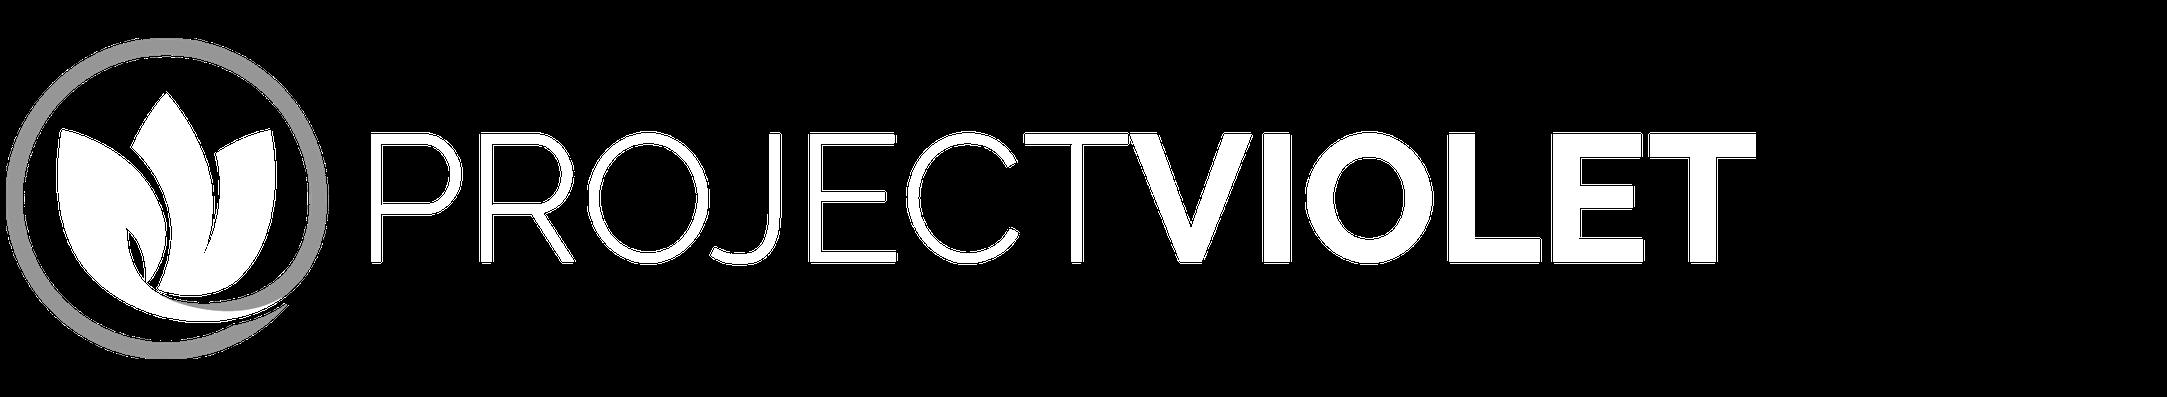 Project Violet